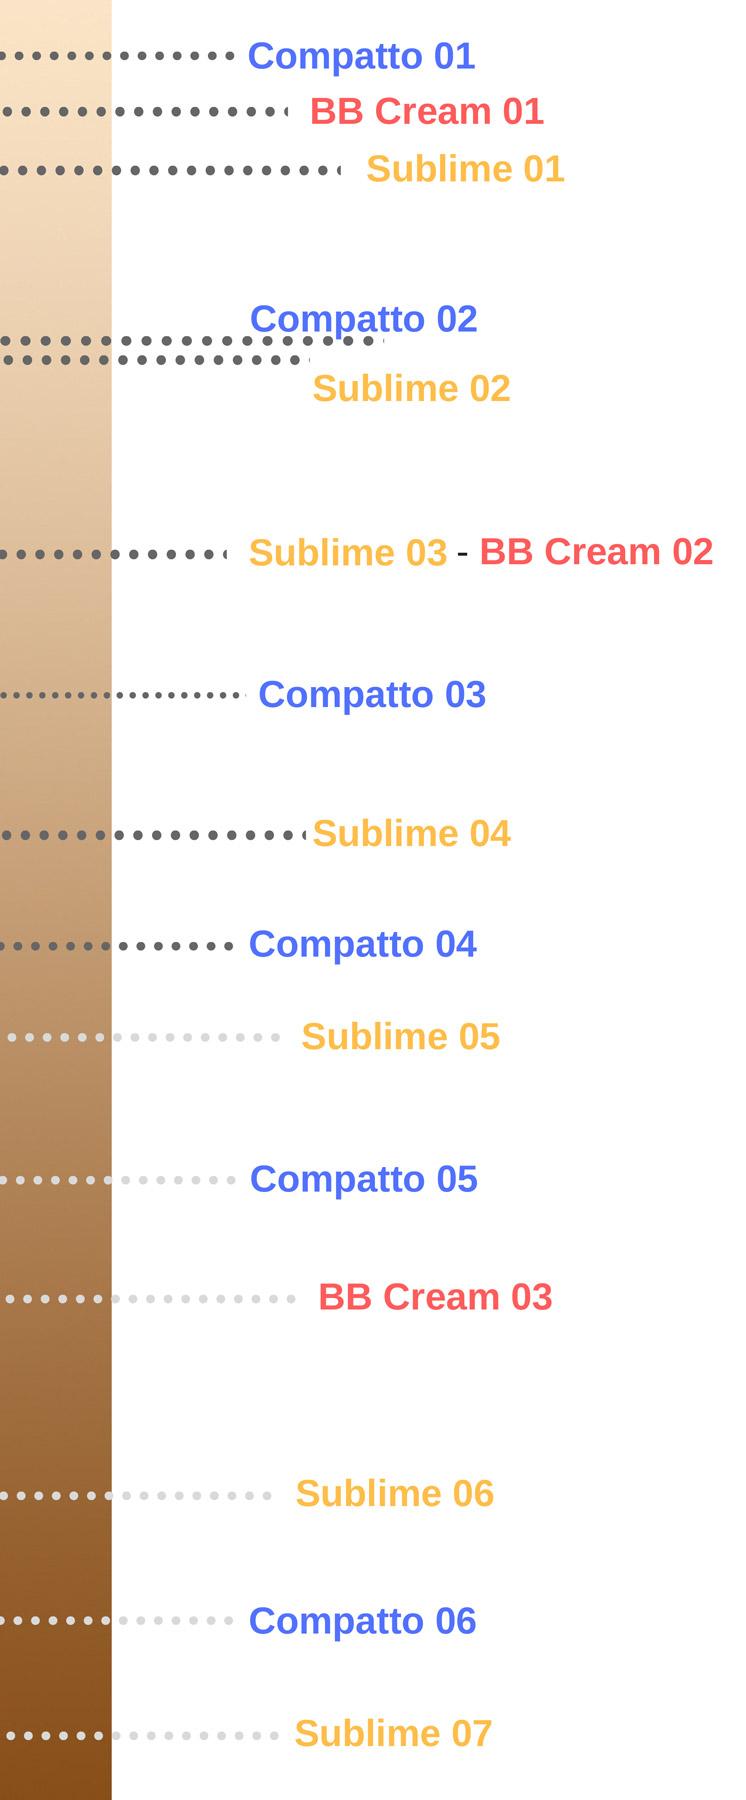 Fondotinta PuroBIO Cosmetics tonalità